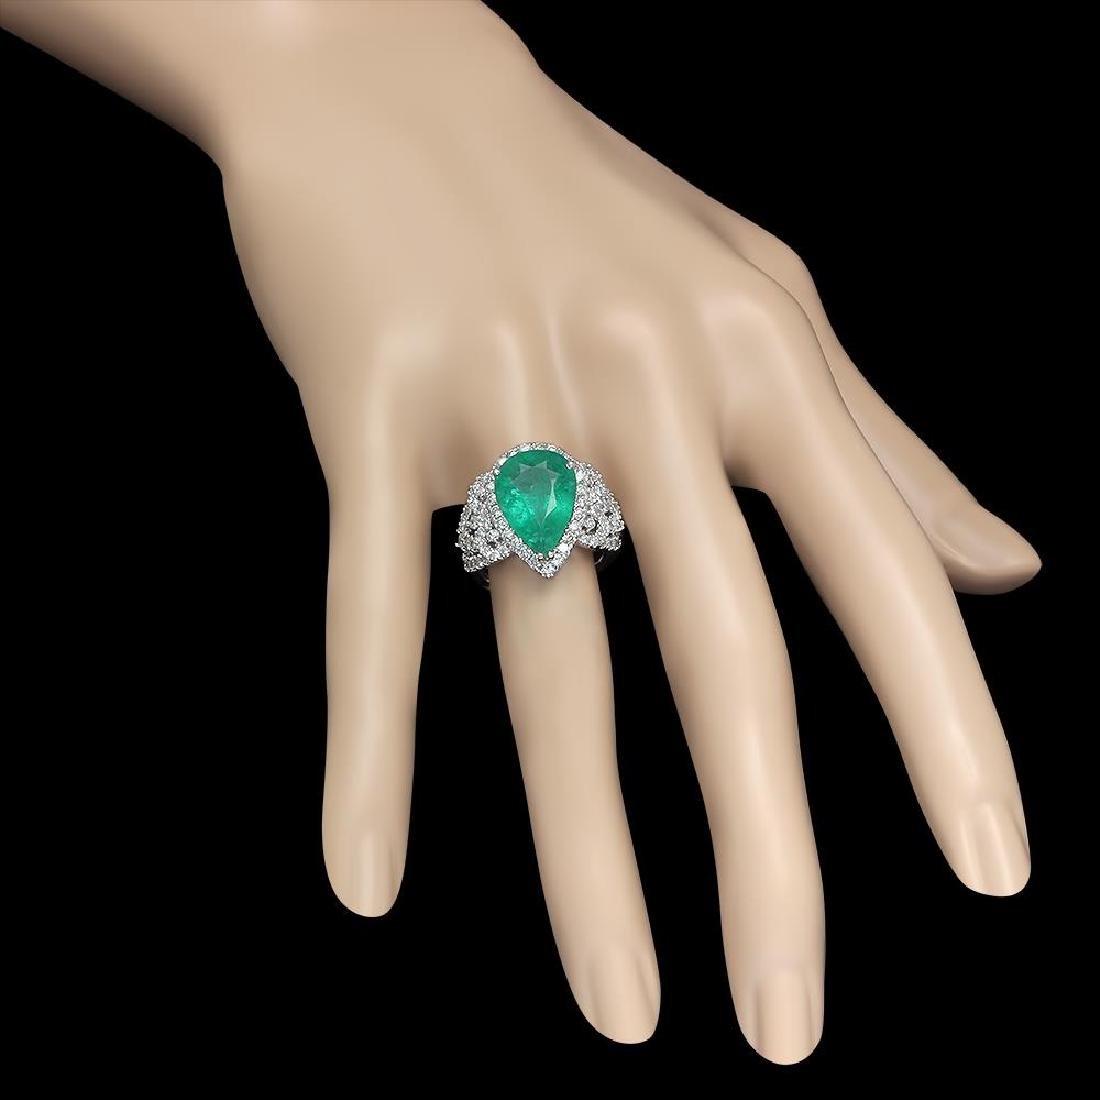 14K Gold 4.55 Emerald 1.20 Diamond Ring - 3